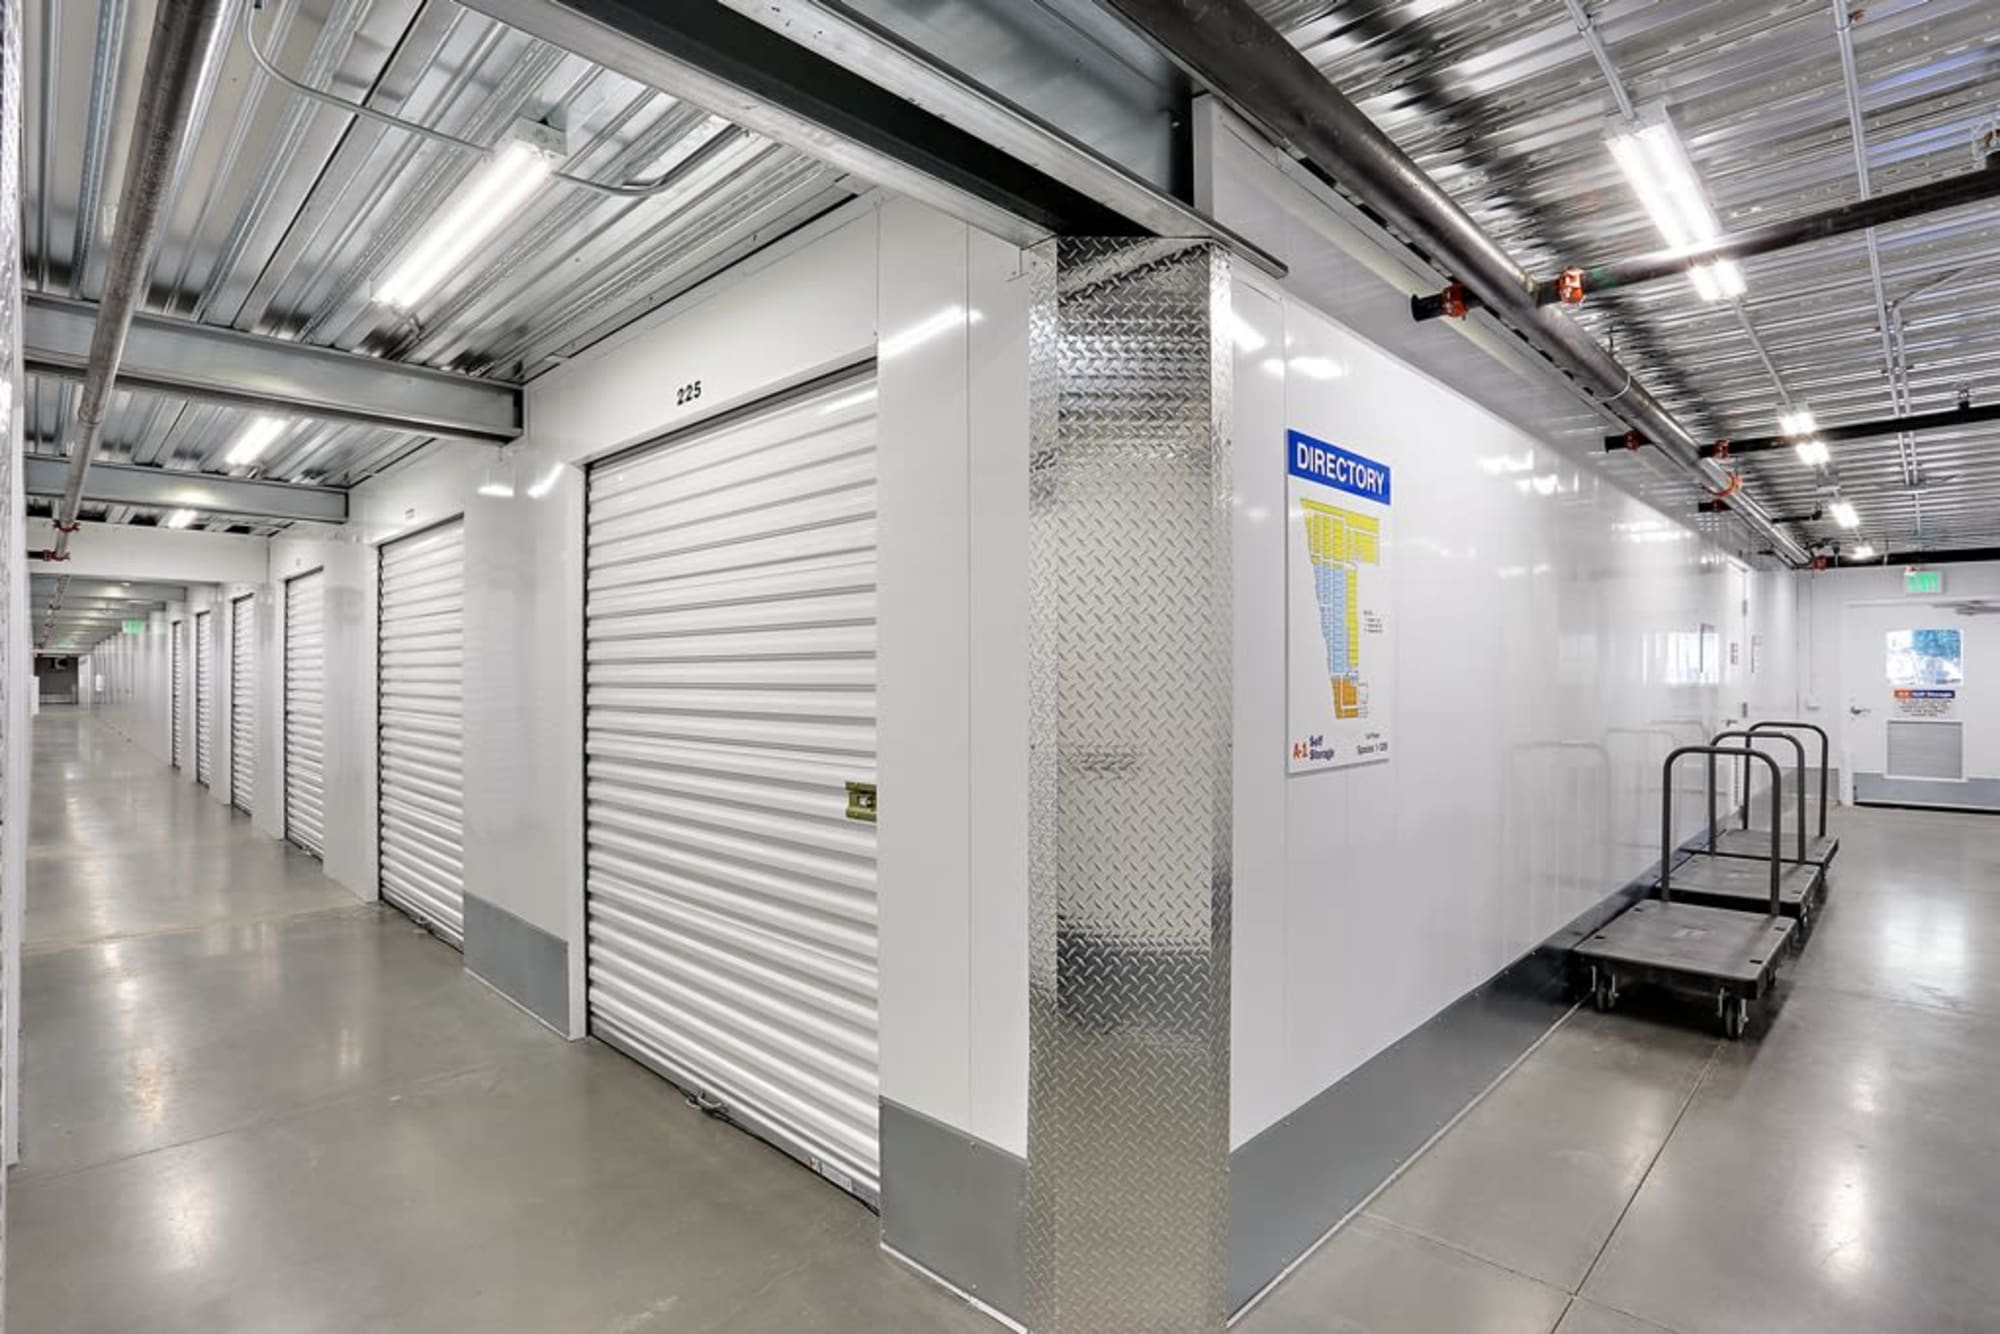 Interior storage units at A-1 Self Storage in San Diego, California